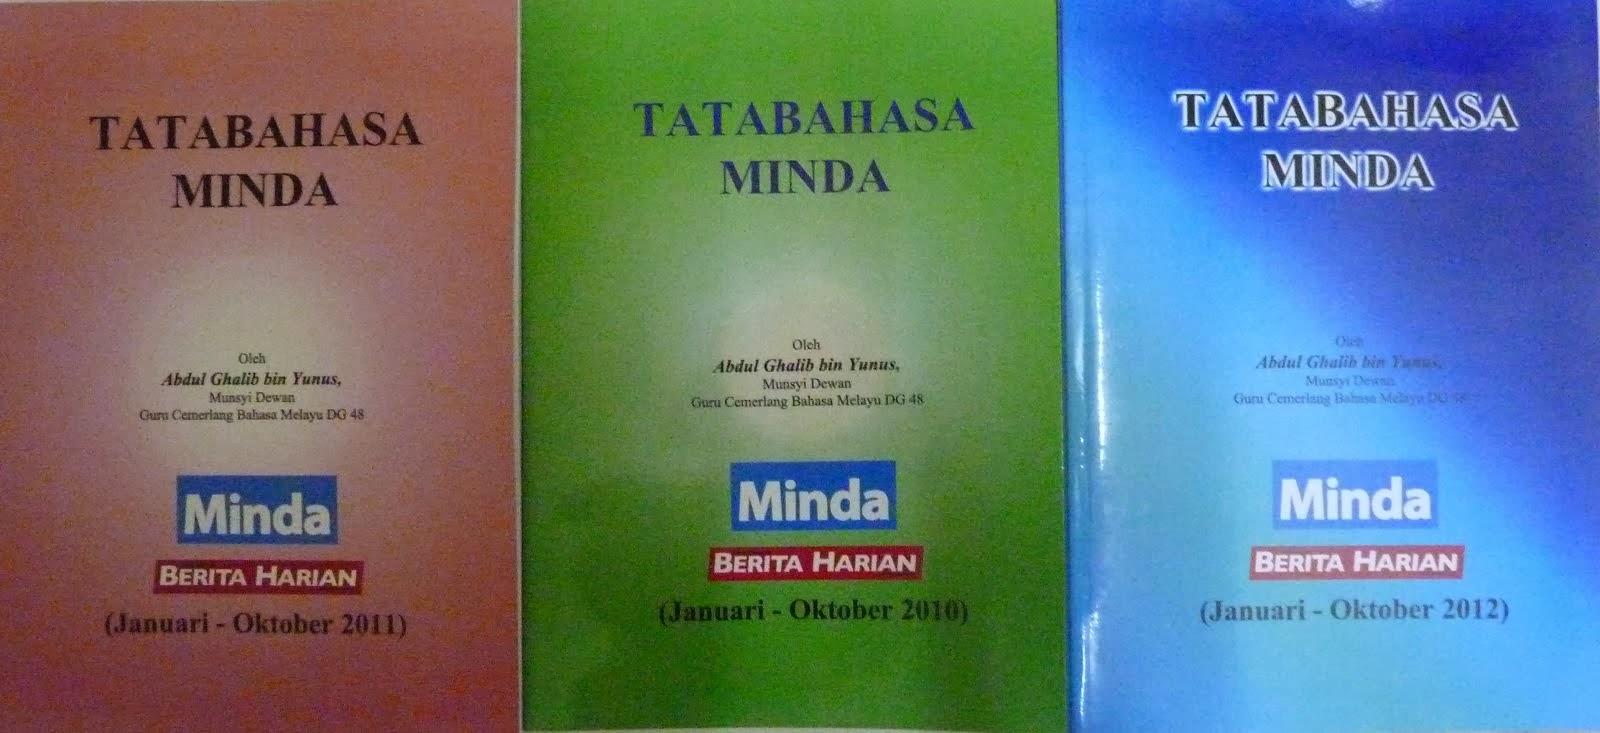 Buku Tatabahasa Minda 2010, 2011 dan 2012